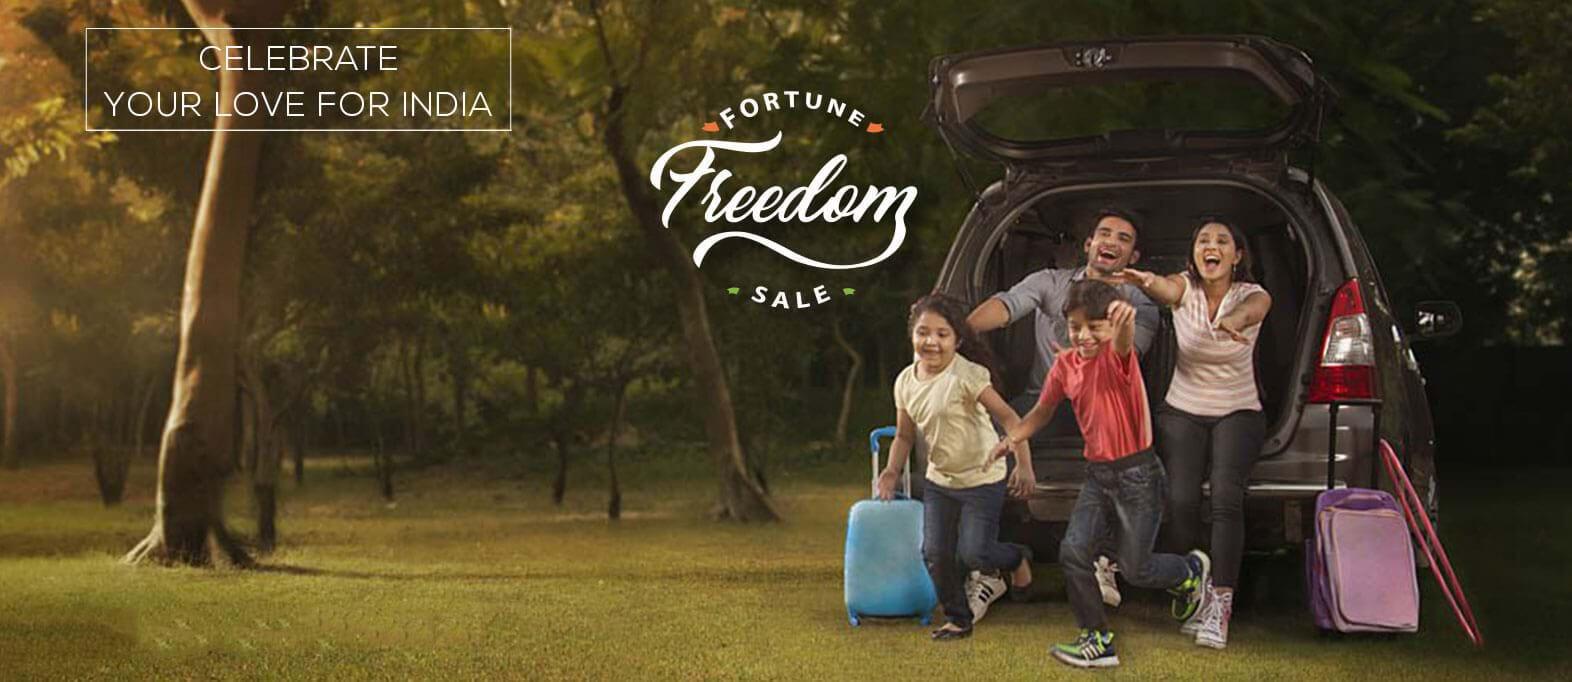 Freedom Sale